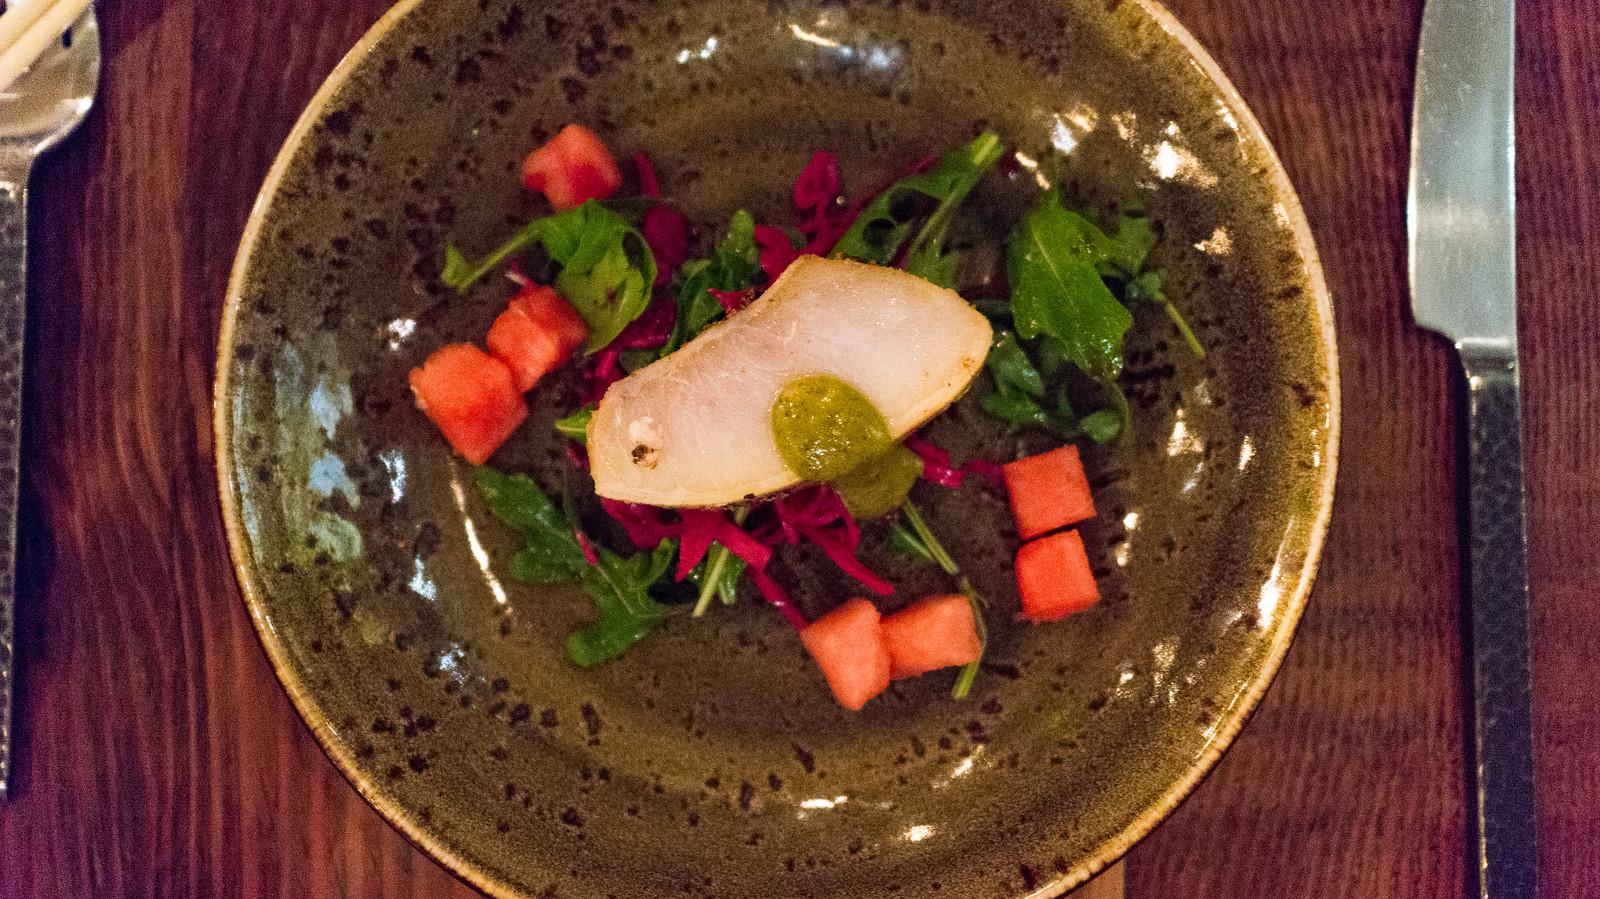 food for thought | a miami food blog: CobaYeo at Khong River House